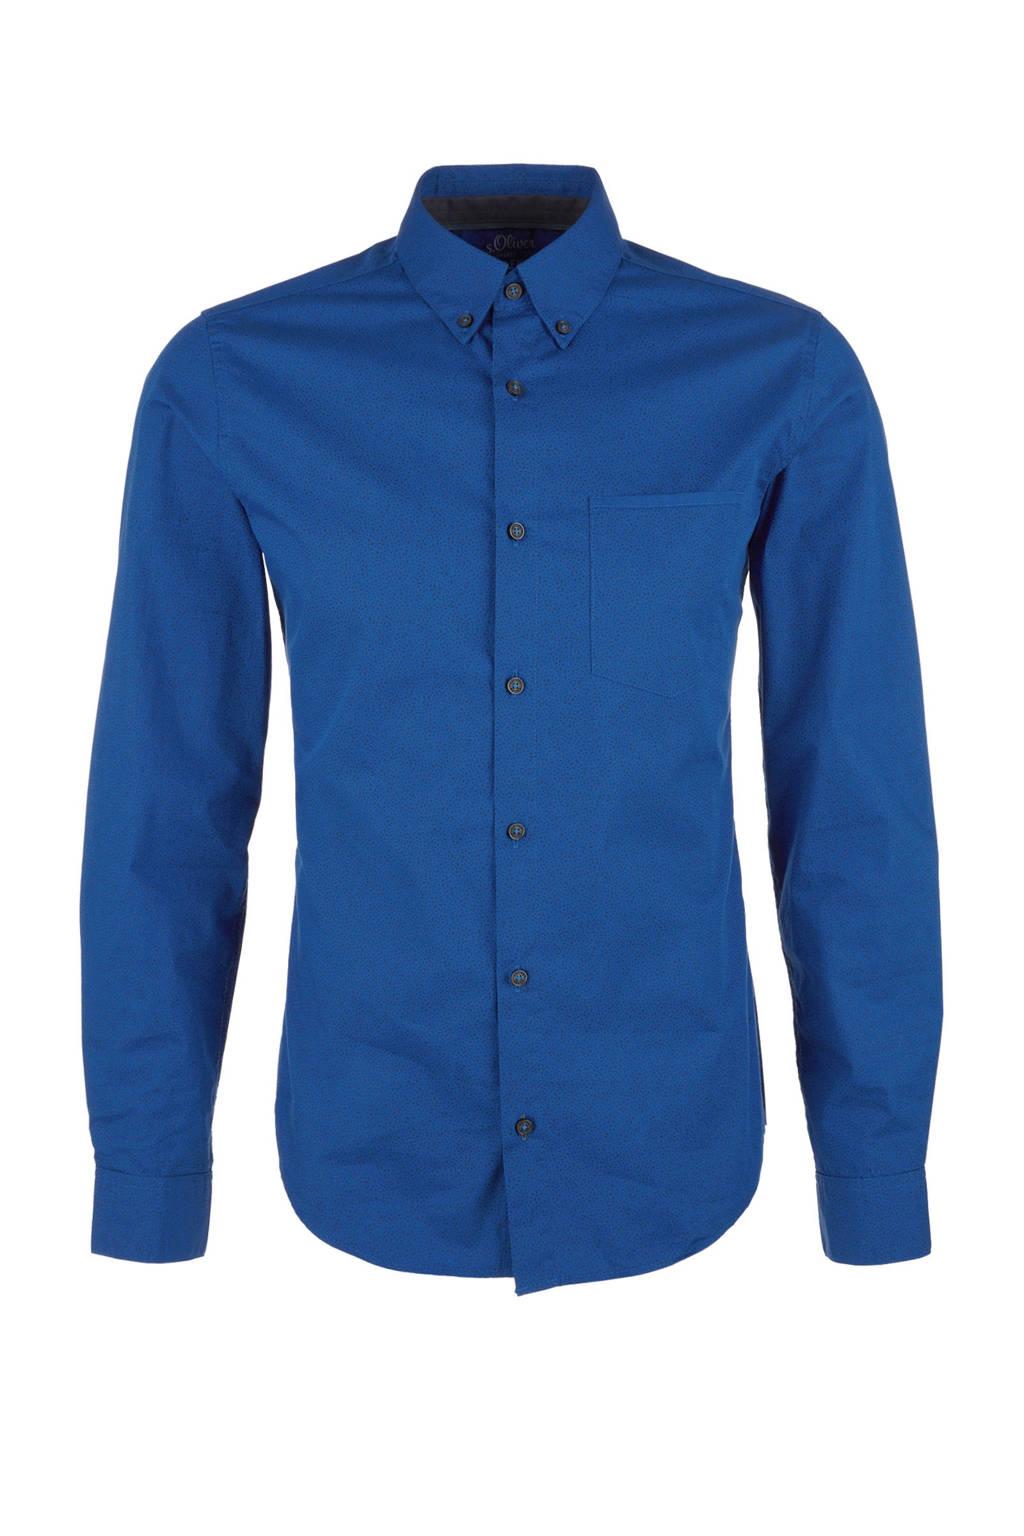 s.Oliver slim fit overhemd met print blauw, Blauw